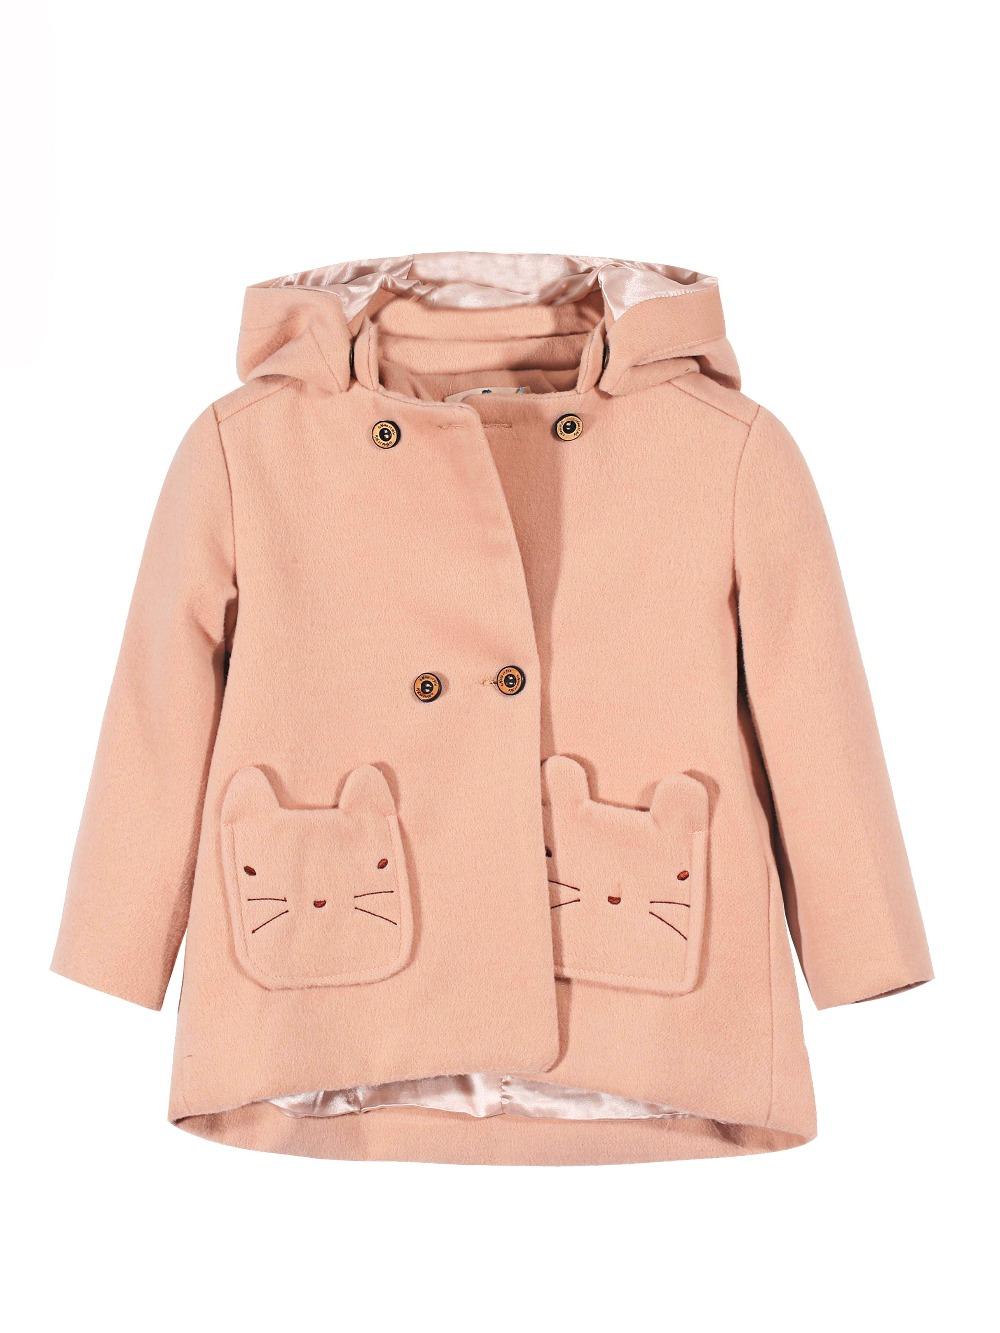 2016 Winter New Item Baby Girls Fashion Denim Jacket Girls Short-style Bow-print Denim Outerwear Jacket Child Denim Coat(China (Mainland))